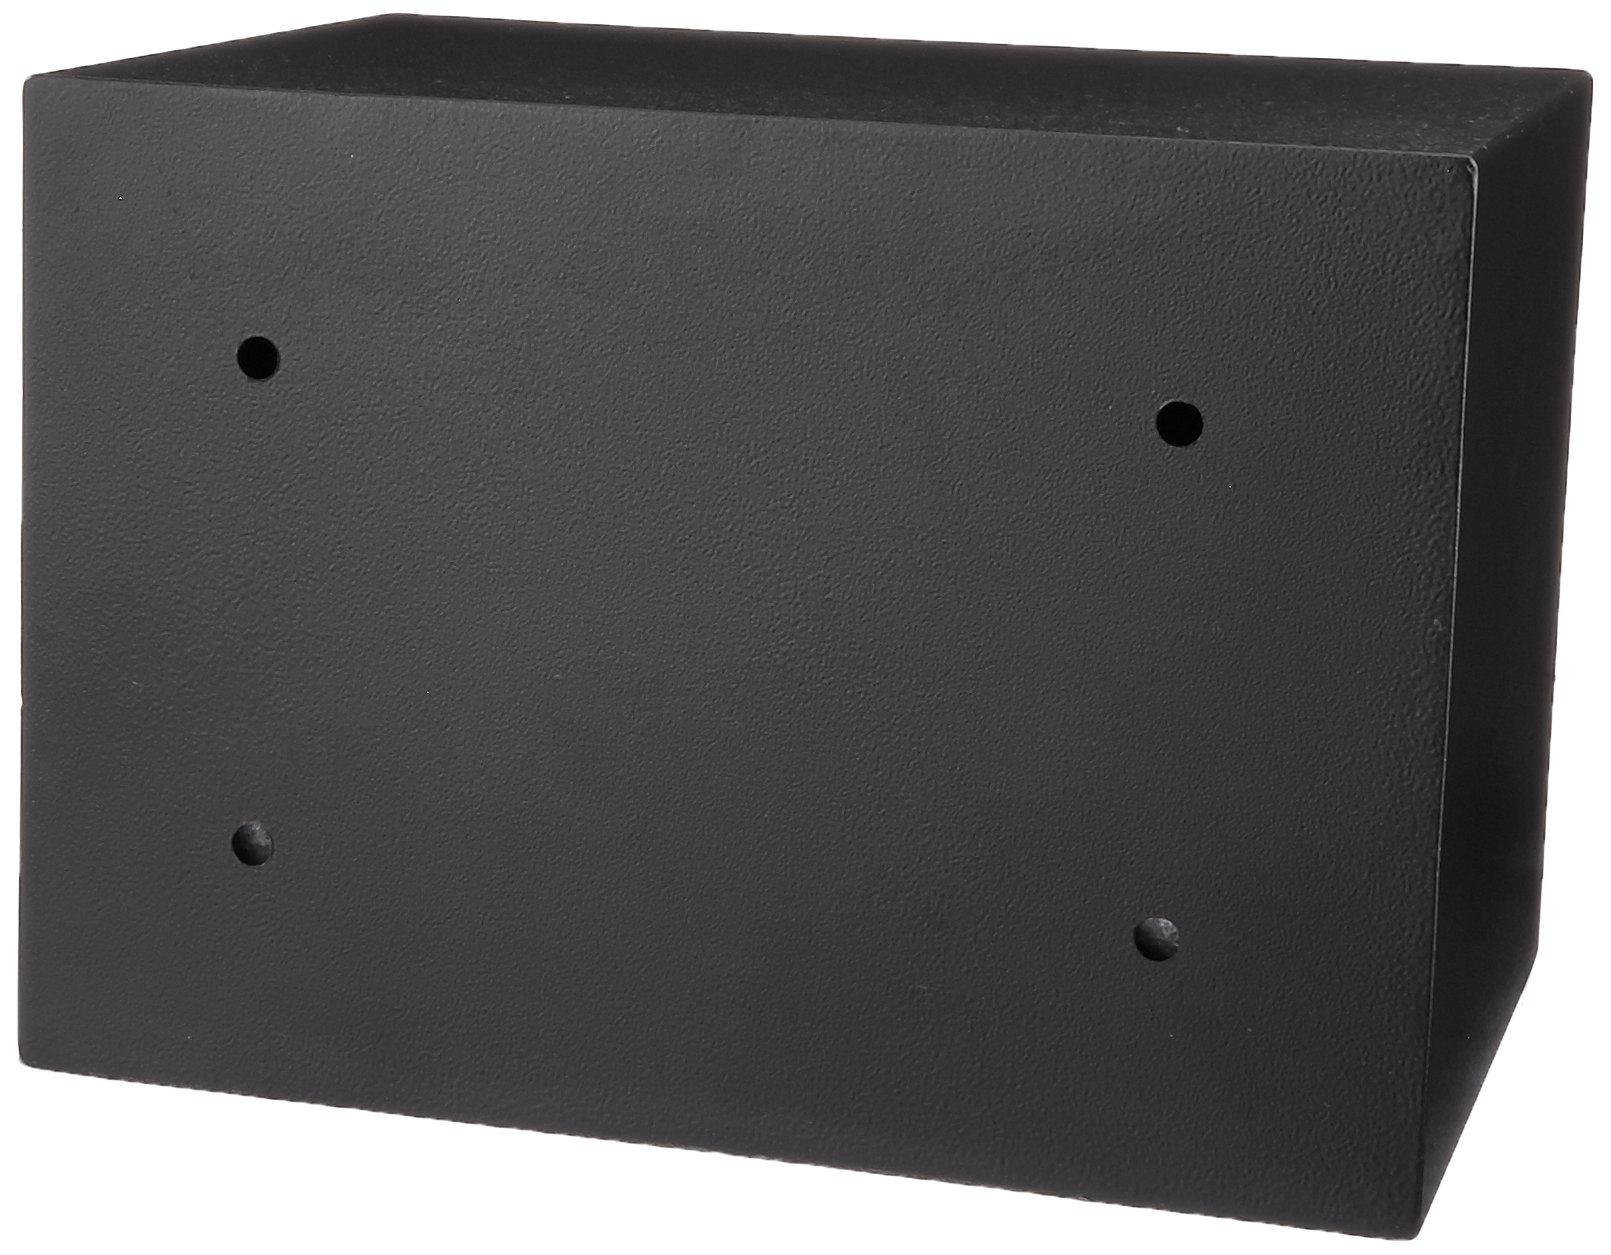 AmazonBasics Security Safe Box, 0.5 Cubic Feet , Black - 25EI